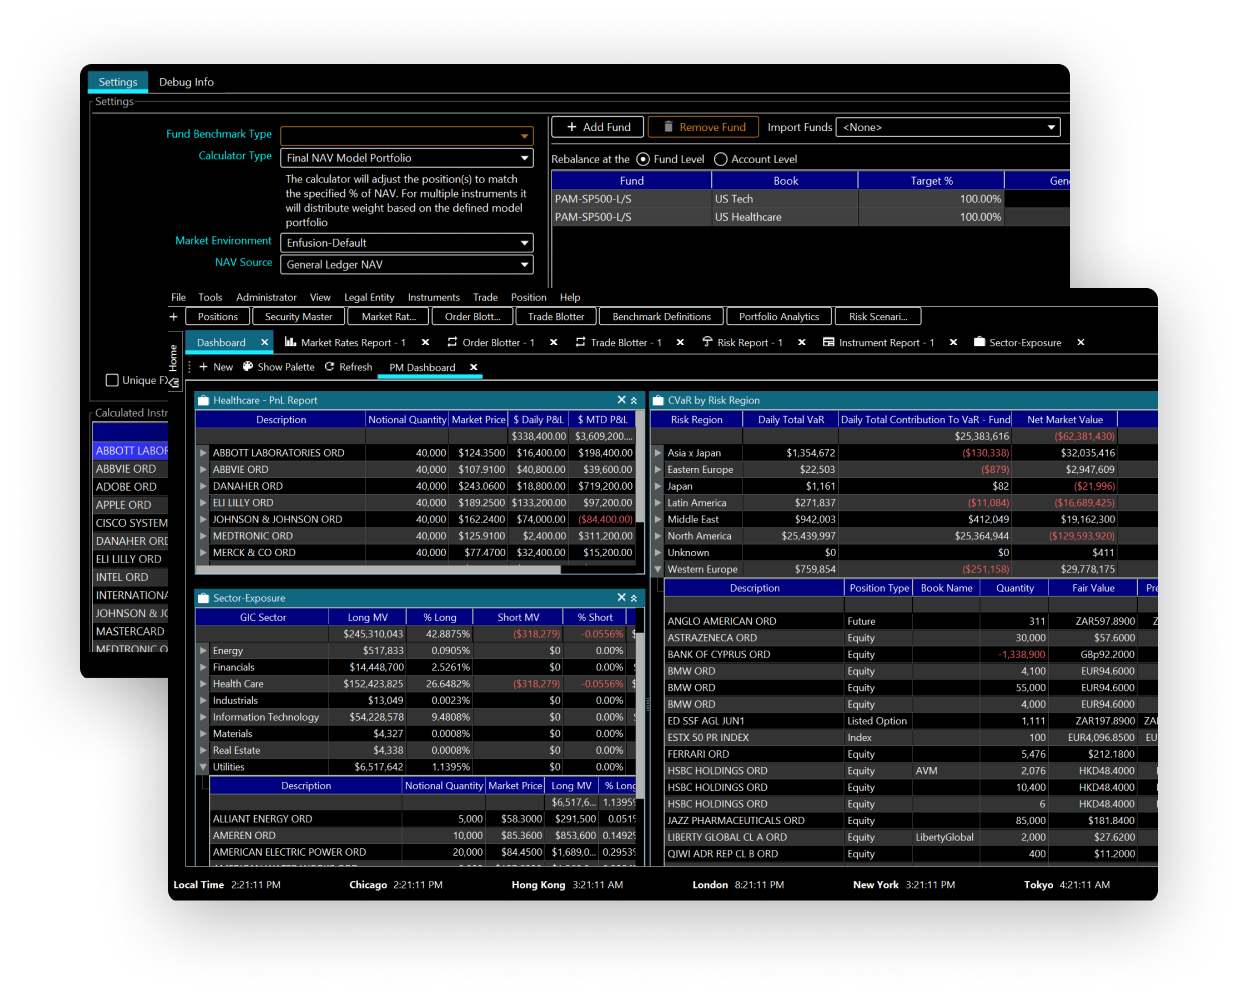 LaunchFund_BodyScreens_Desktop